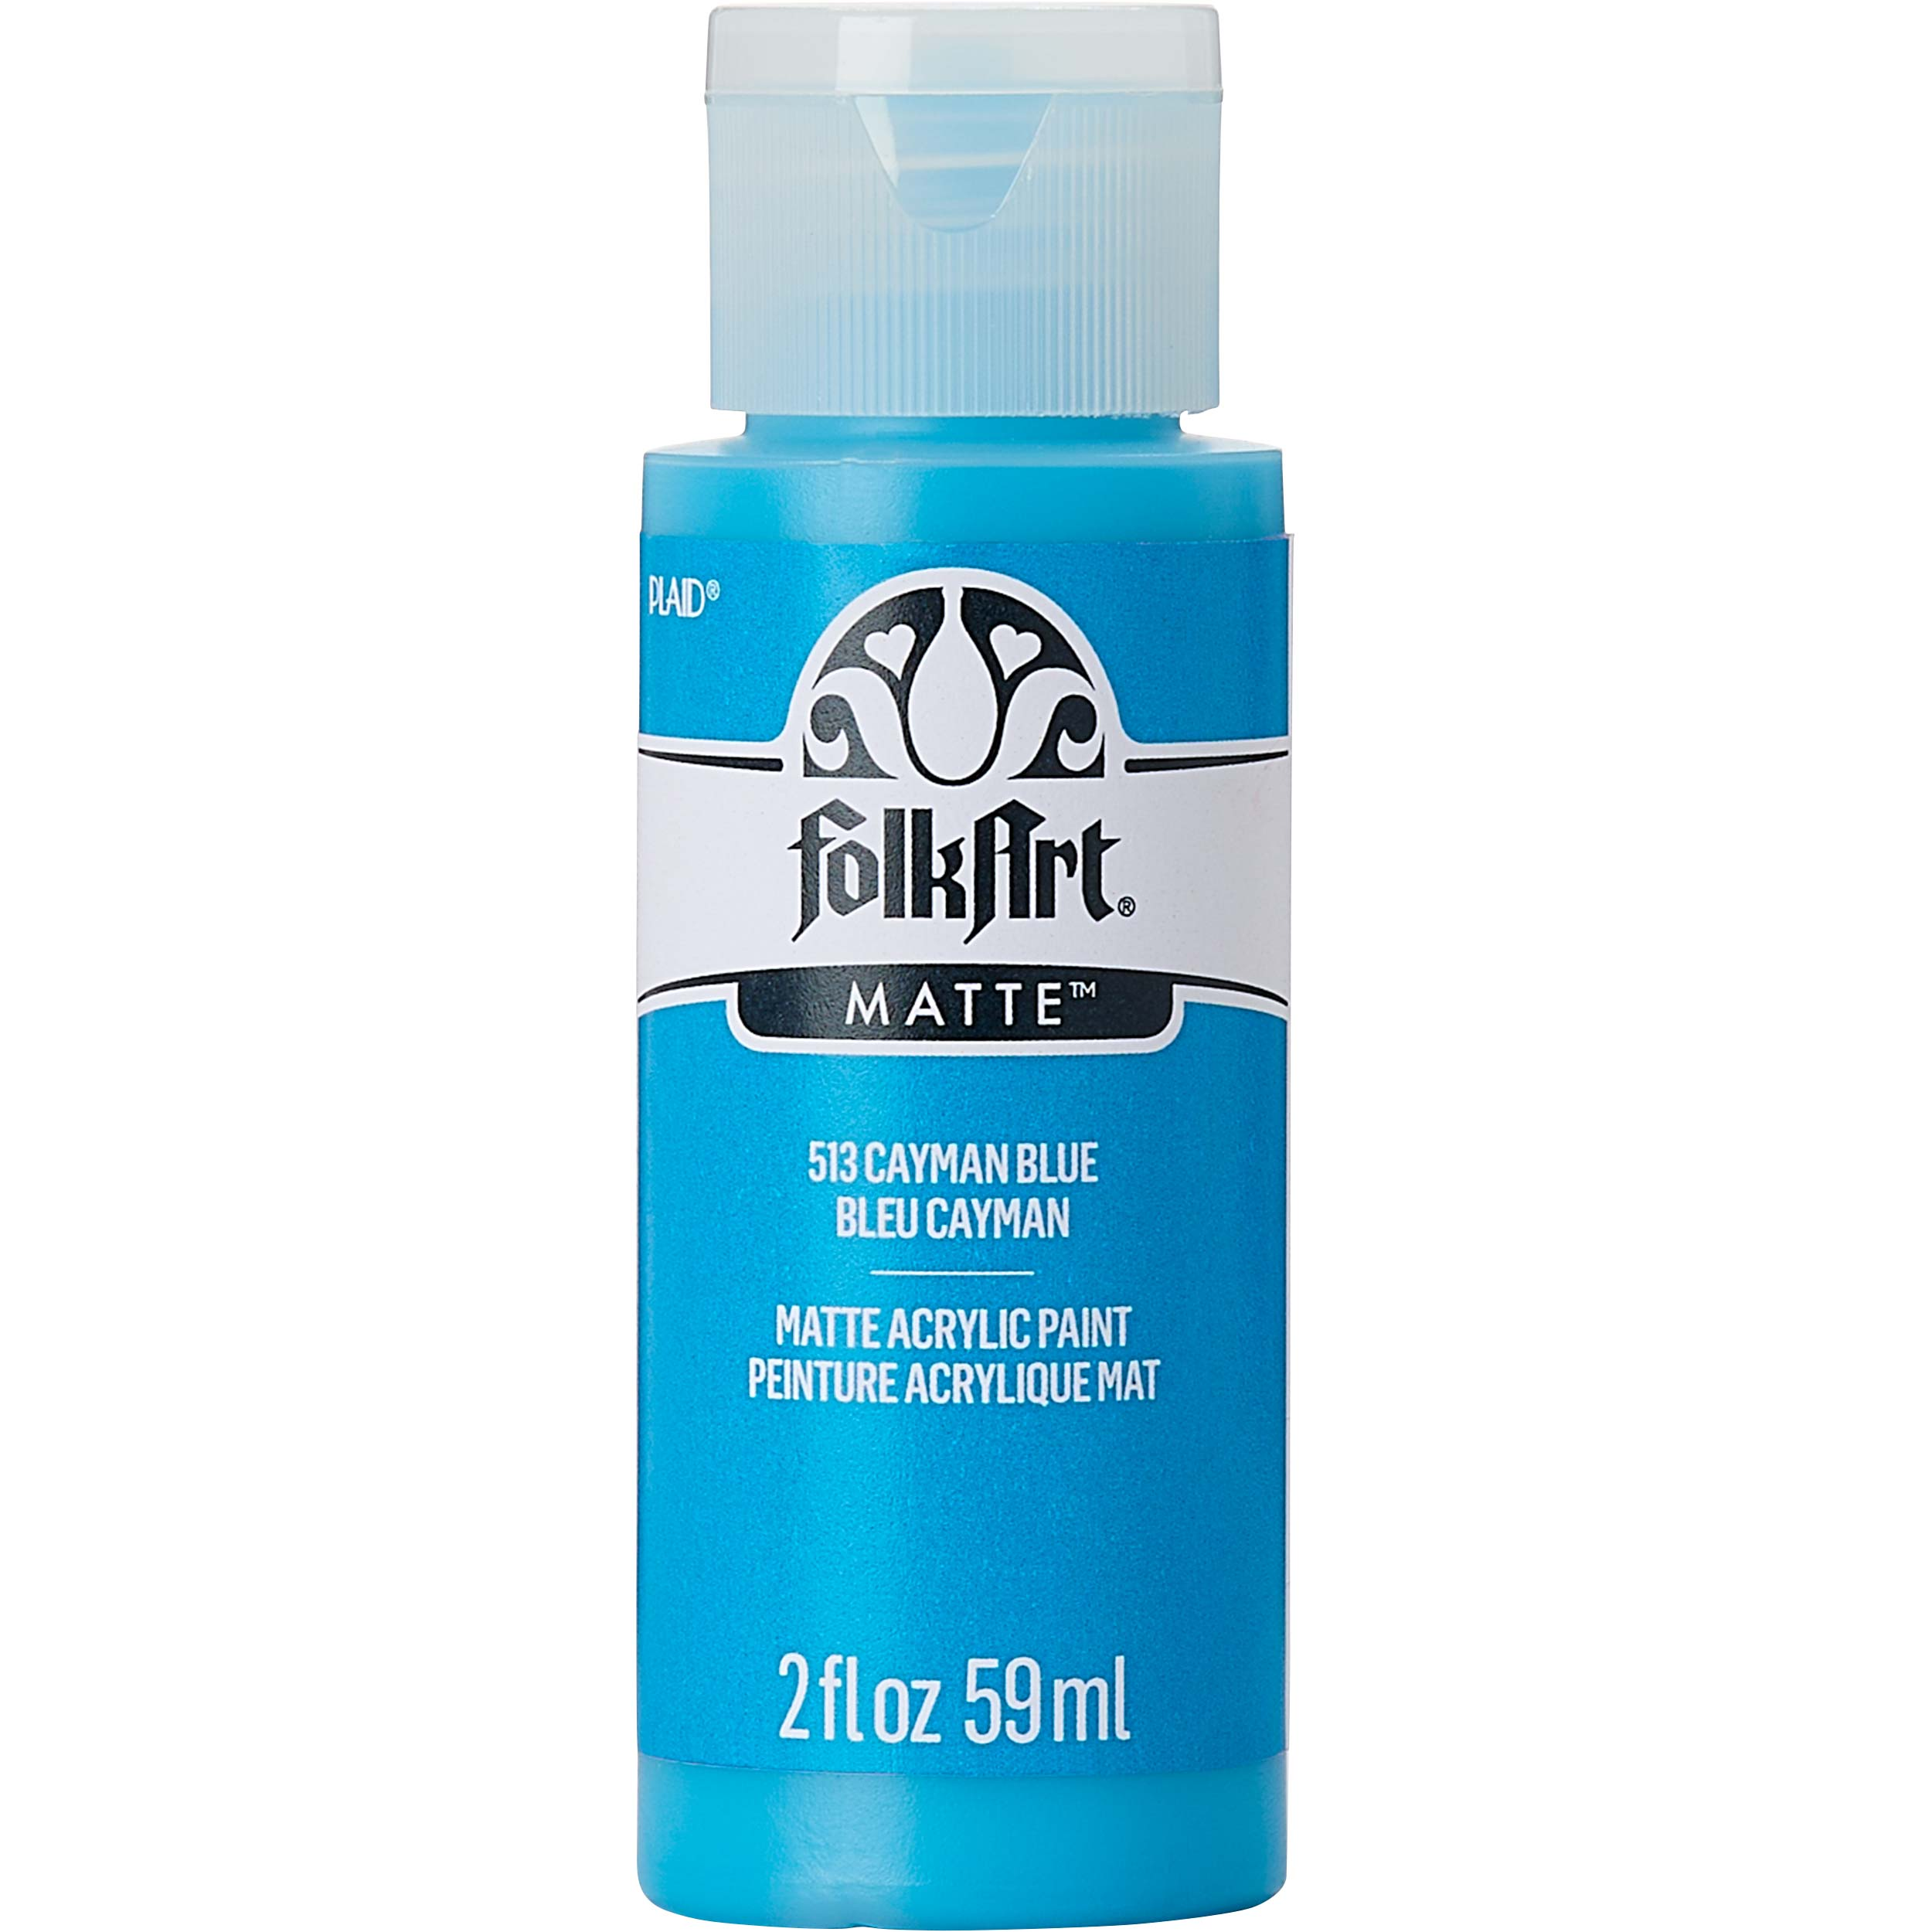 FolkArt ® Acrylic Colors - Cayman Blue, 2 oz. - 513